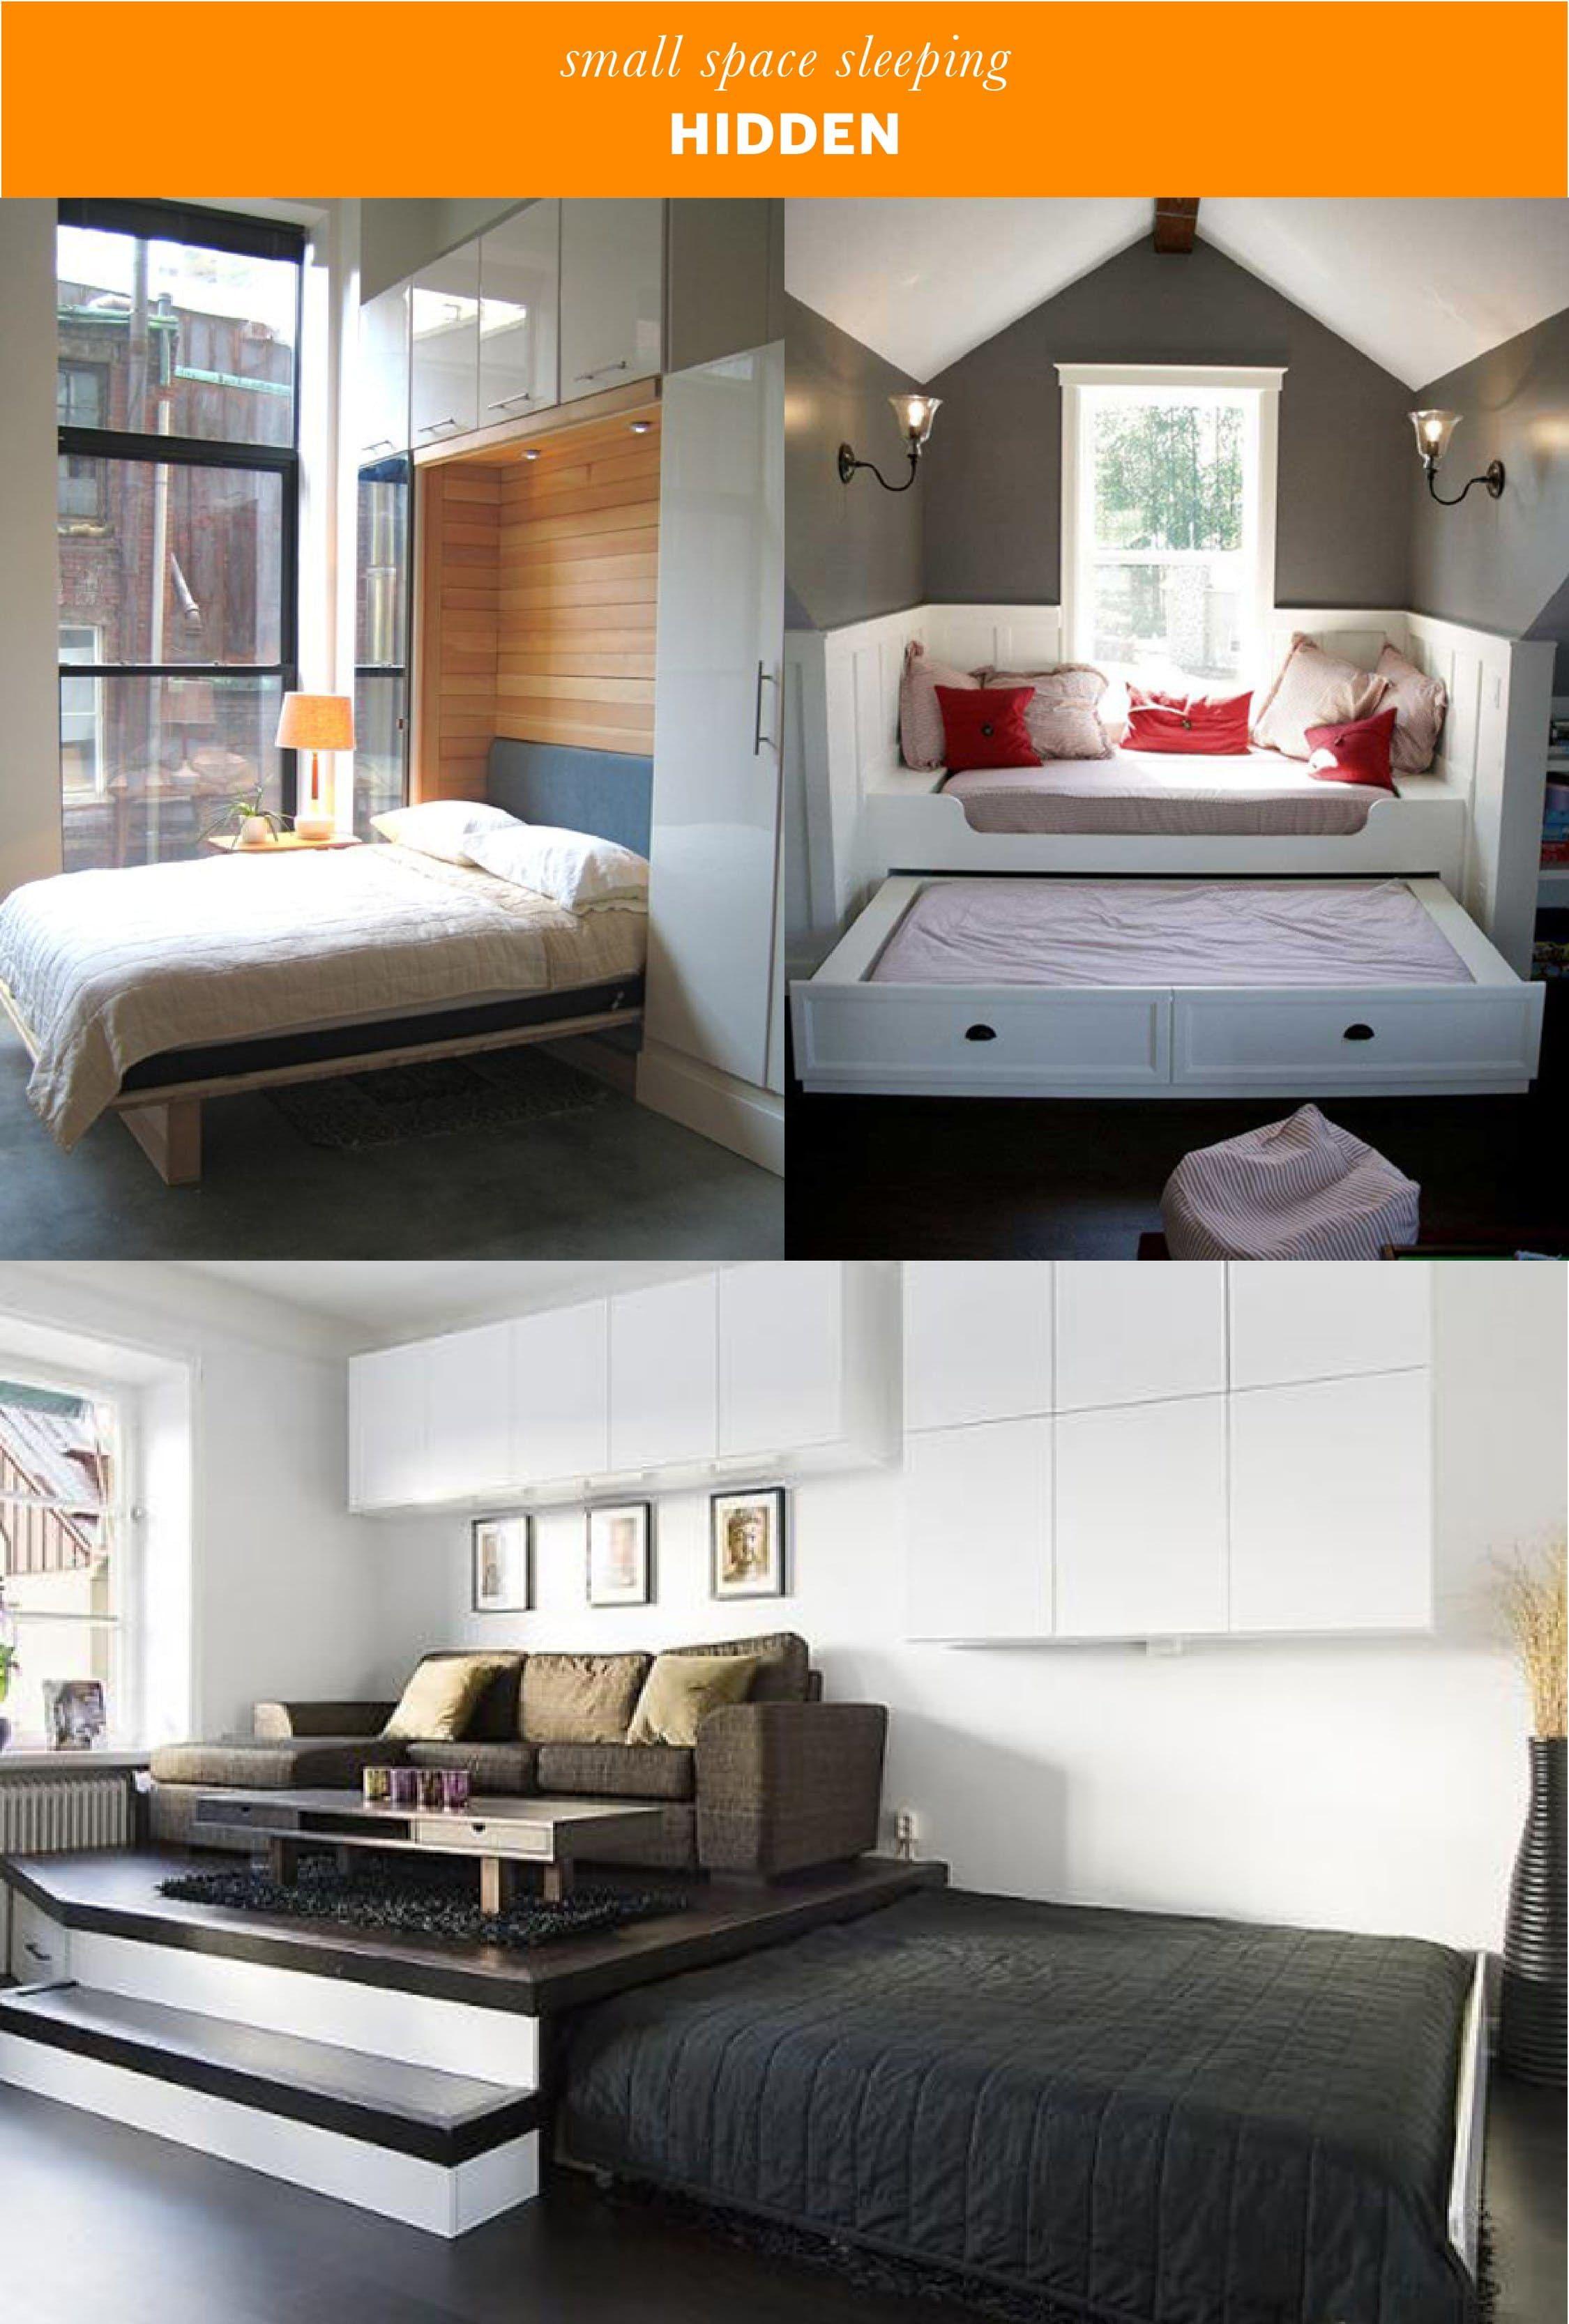 Transformer Apartment Vlad Mishin Ideen Kleine Raume | Small Space Sleeping Solutions Pinterest